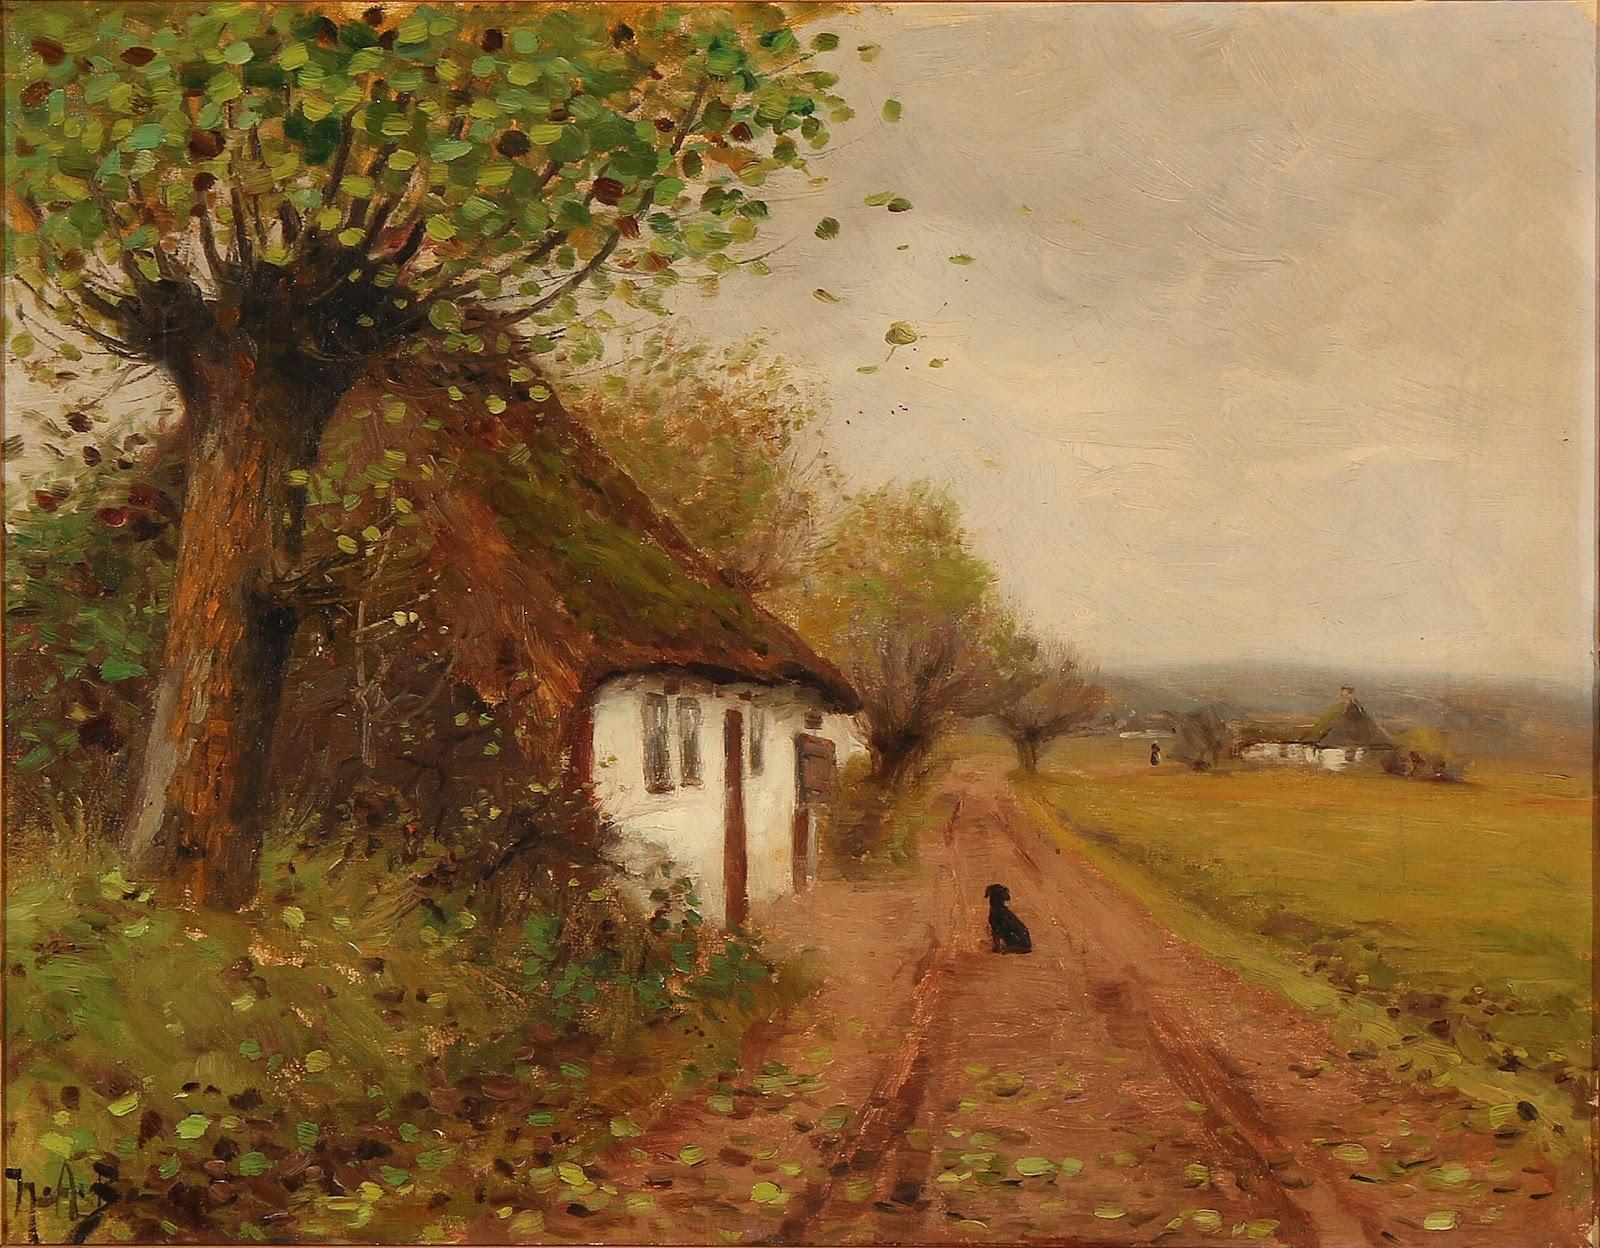 Hans Andersen  rendekilde Landskab med en ventende hund p C A en grusvej